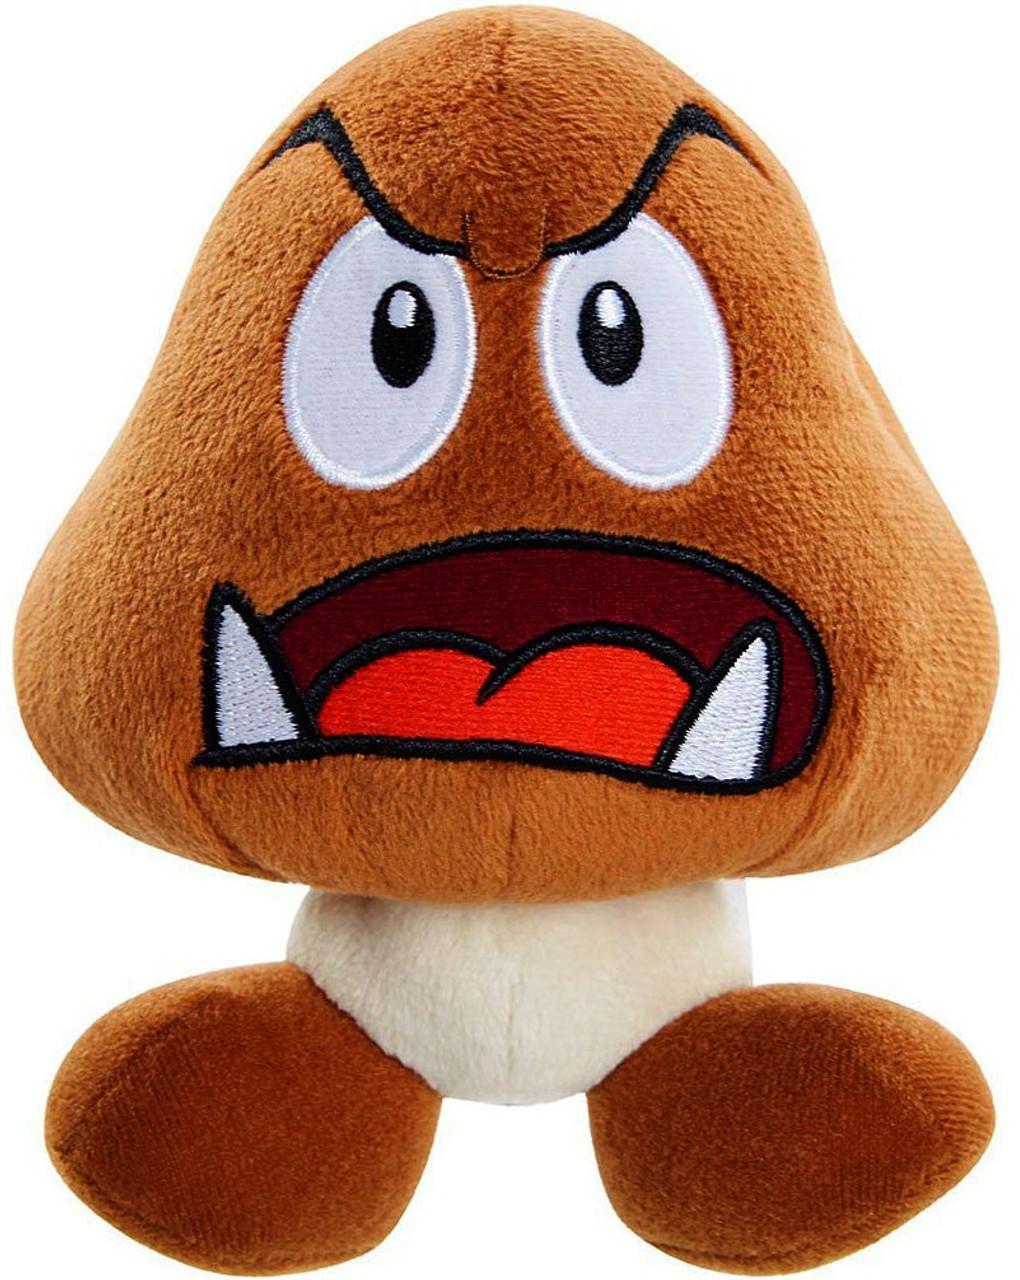 World of Nintendo Super Mario Goomba 6-Inch Plush [Open Mouth]